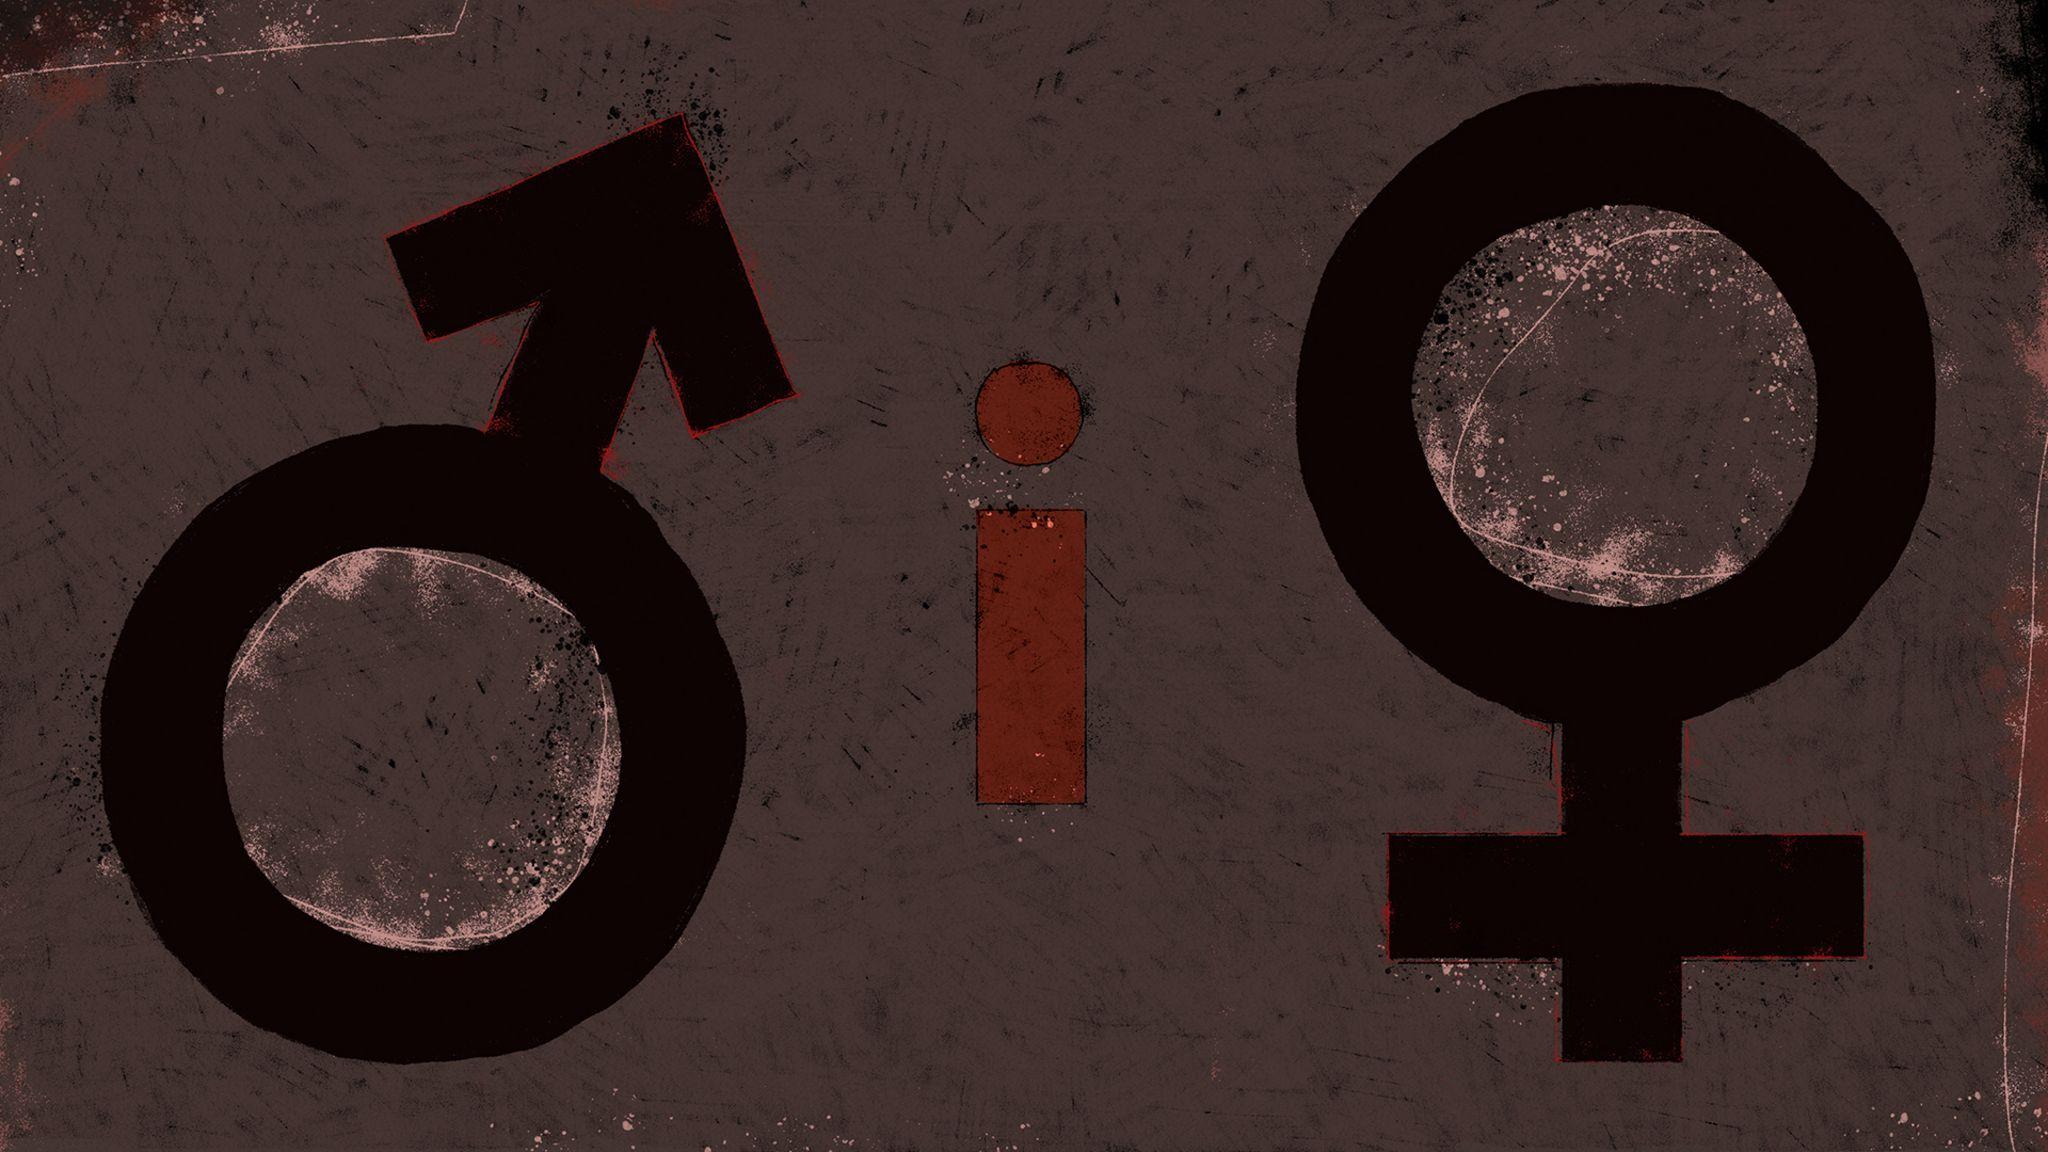 Symbols - male, i marker and female